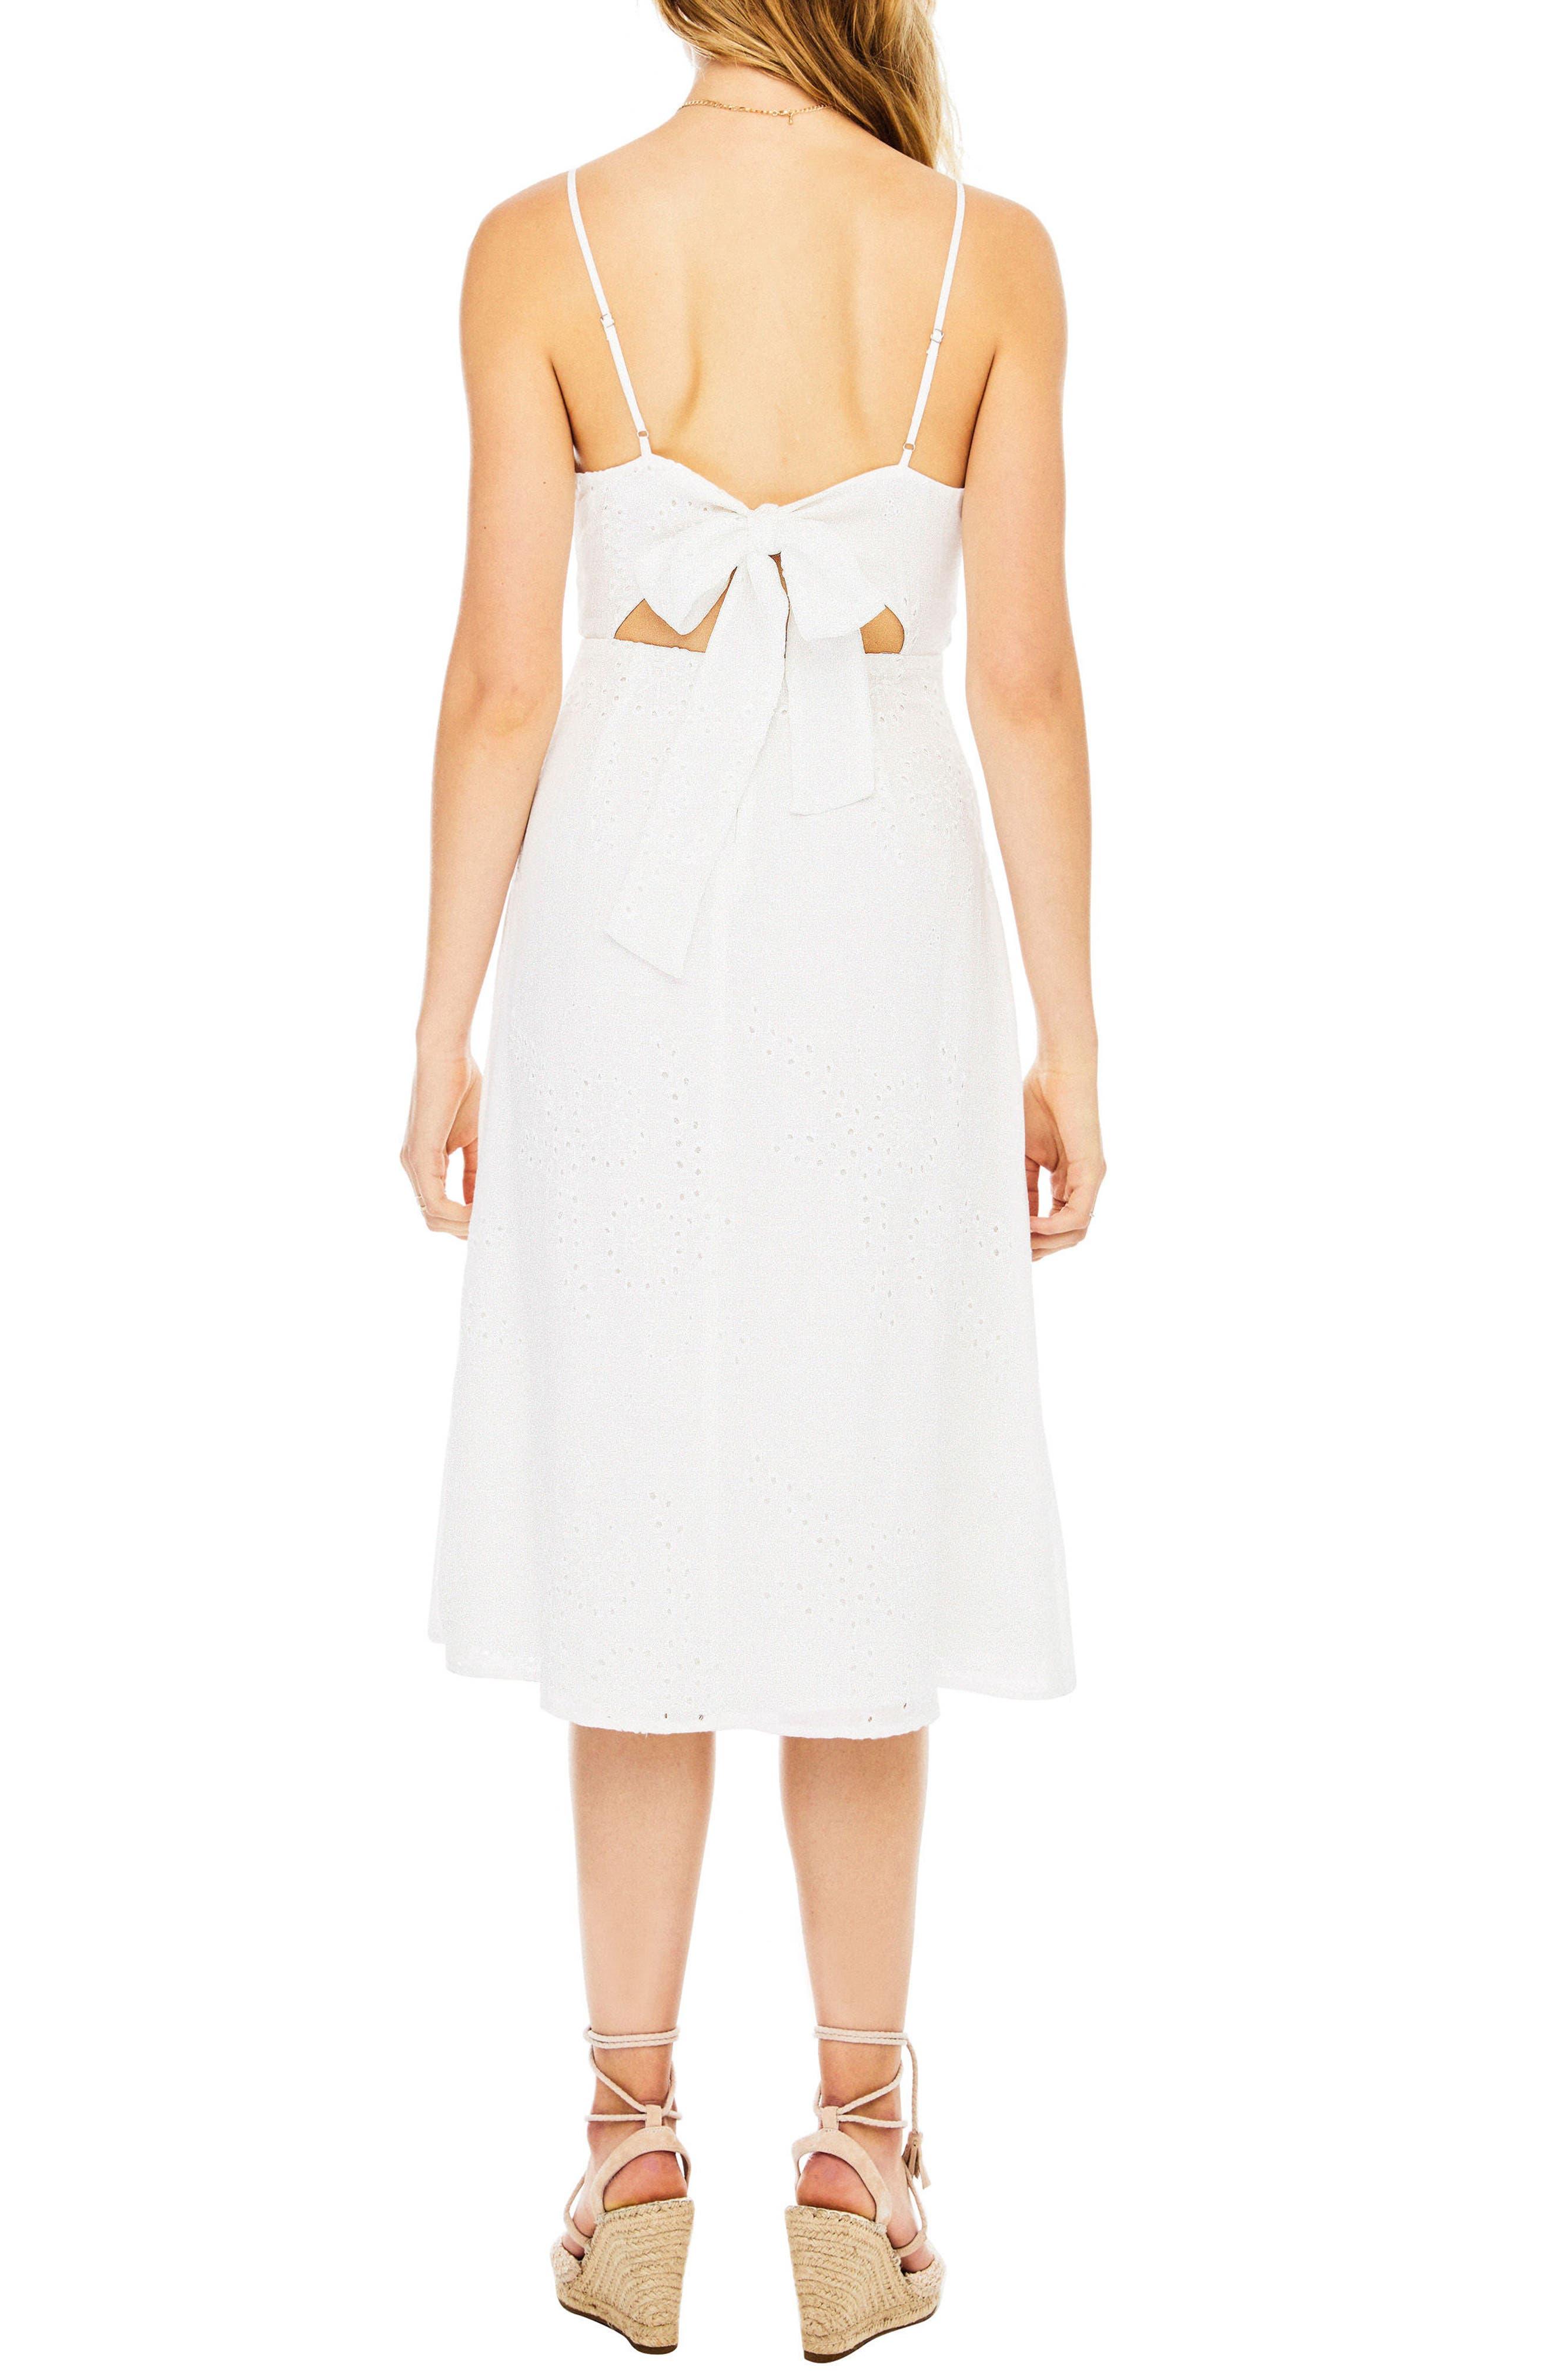 ASTR THE LABEL,                             Ellowyn Dress,                             Alternate thumbnail 2, color,                             100